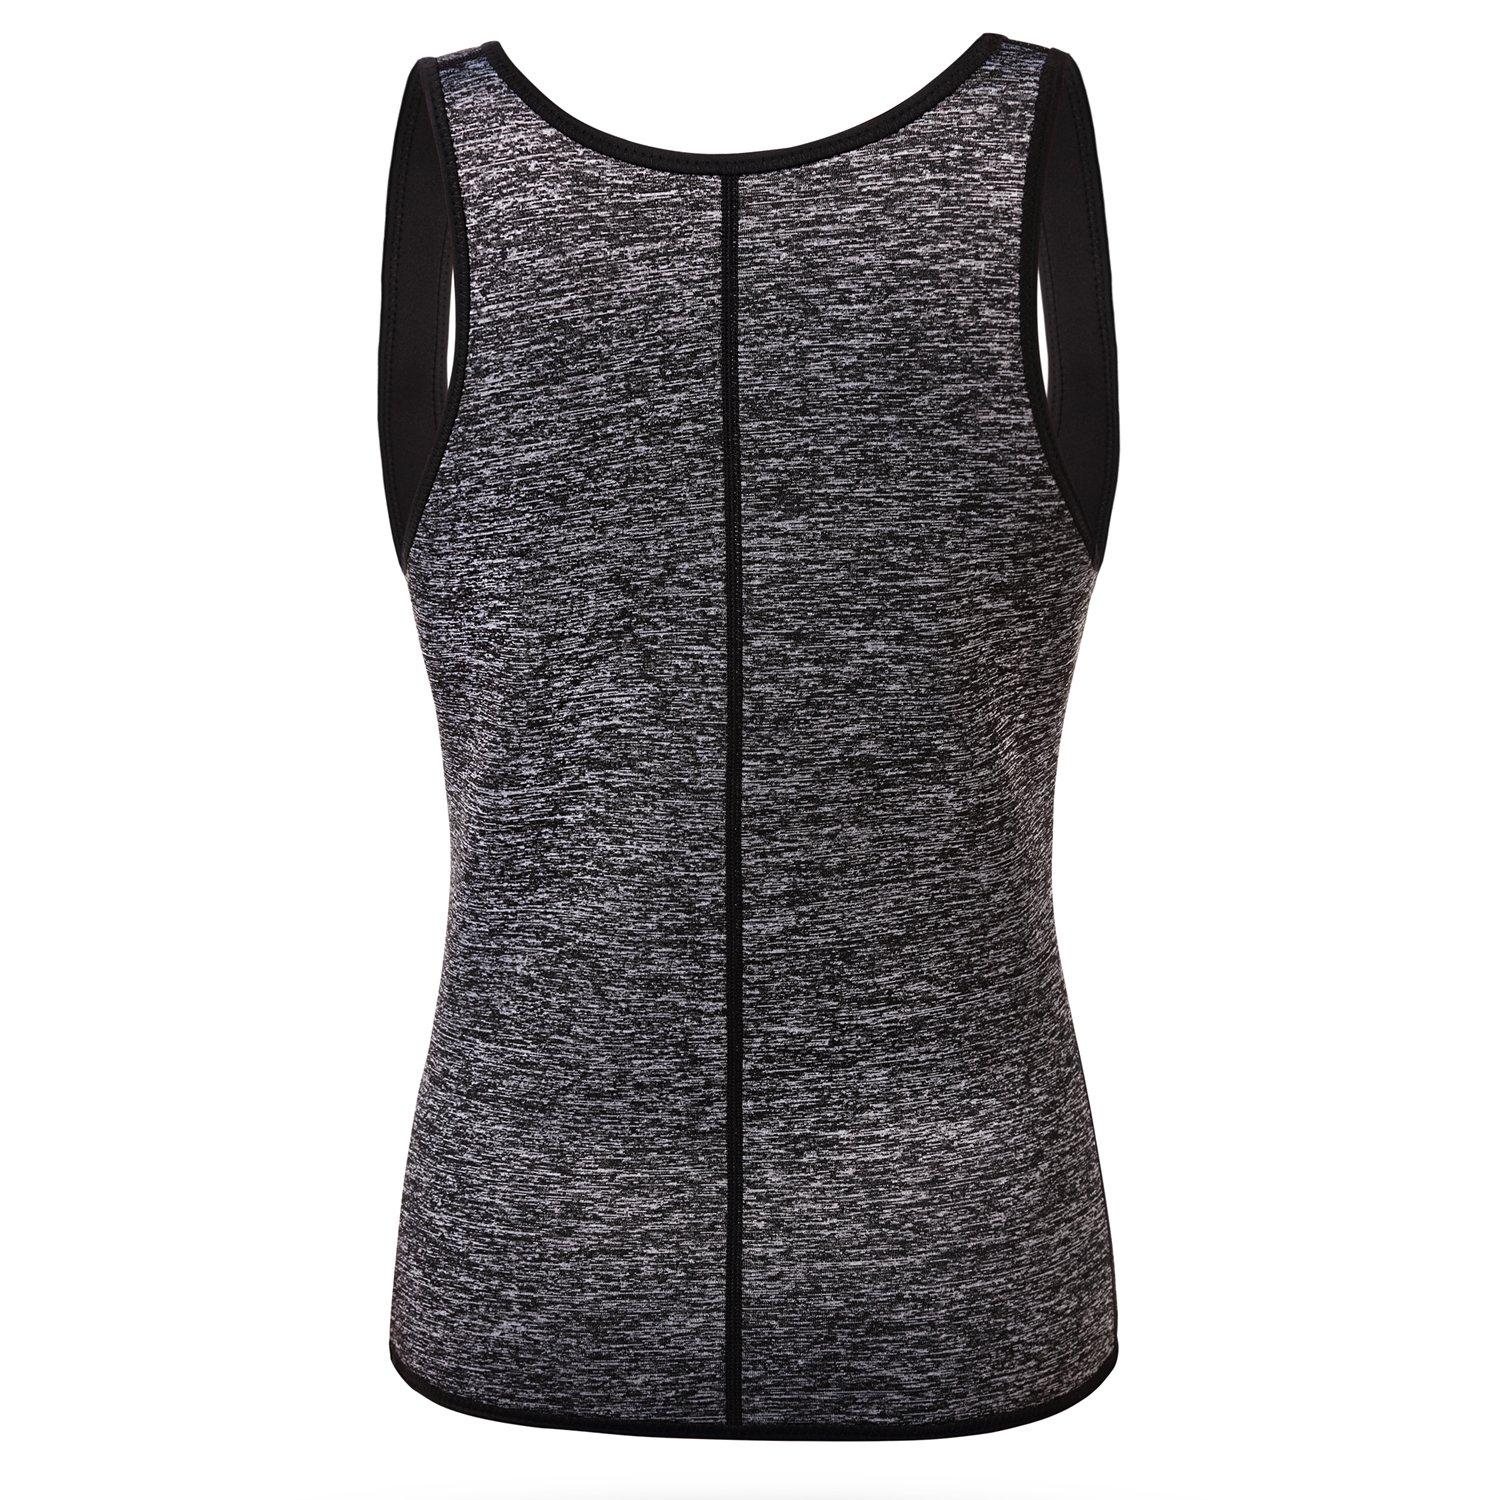 QEESMEI Womens Neoprene Sweat Waist Trainer Cincher Vest Slimming Shirt Body Shaper For Weight Loss (Grey, Small)